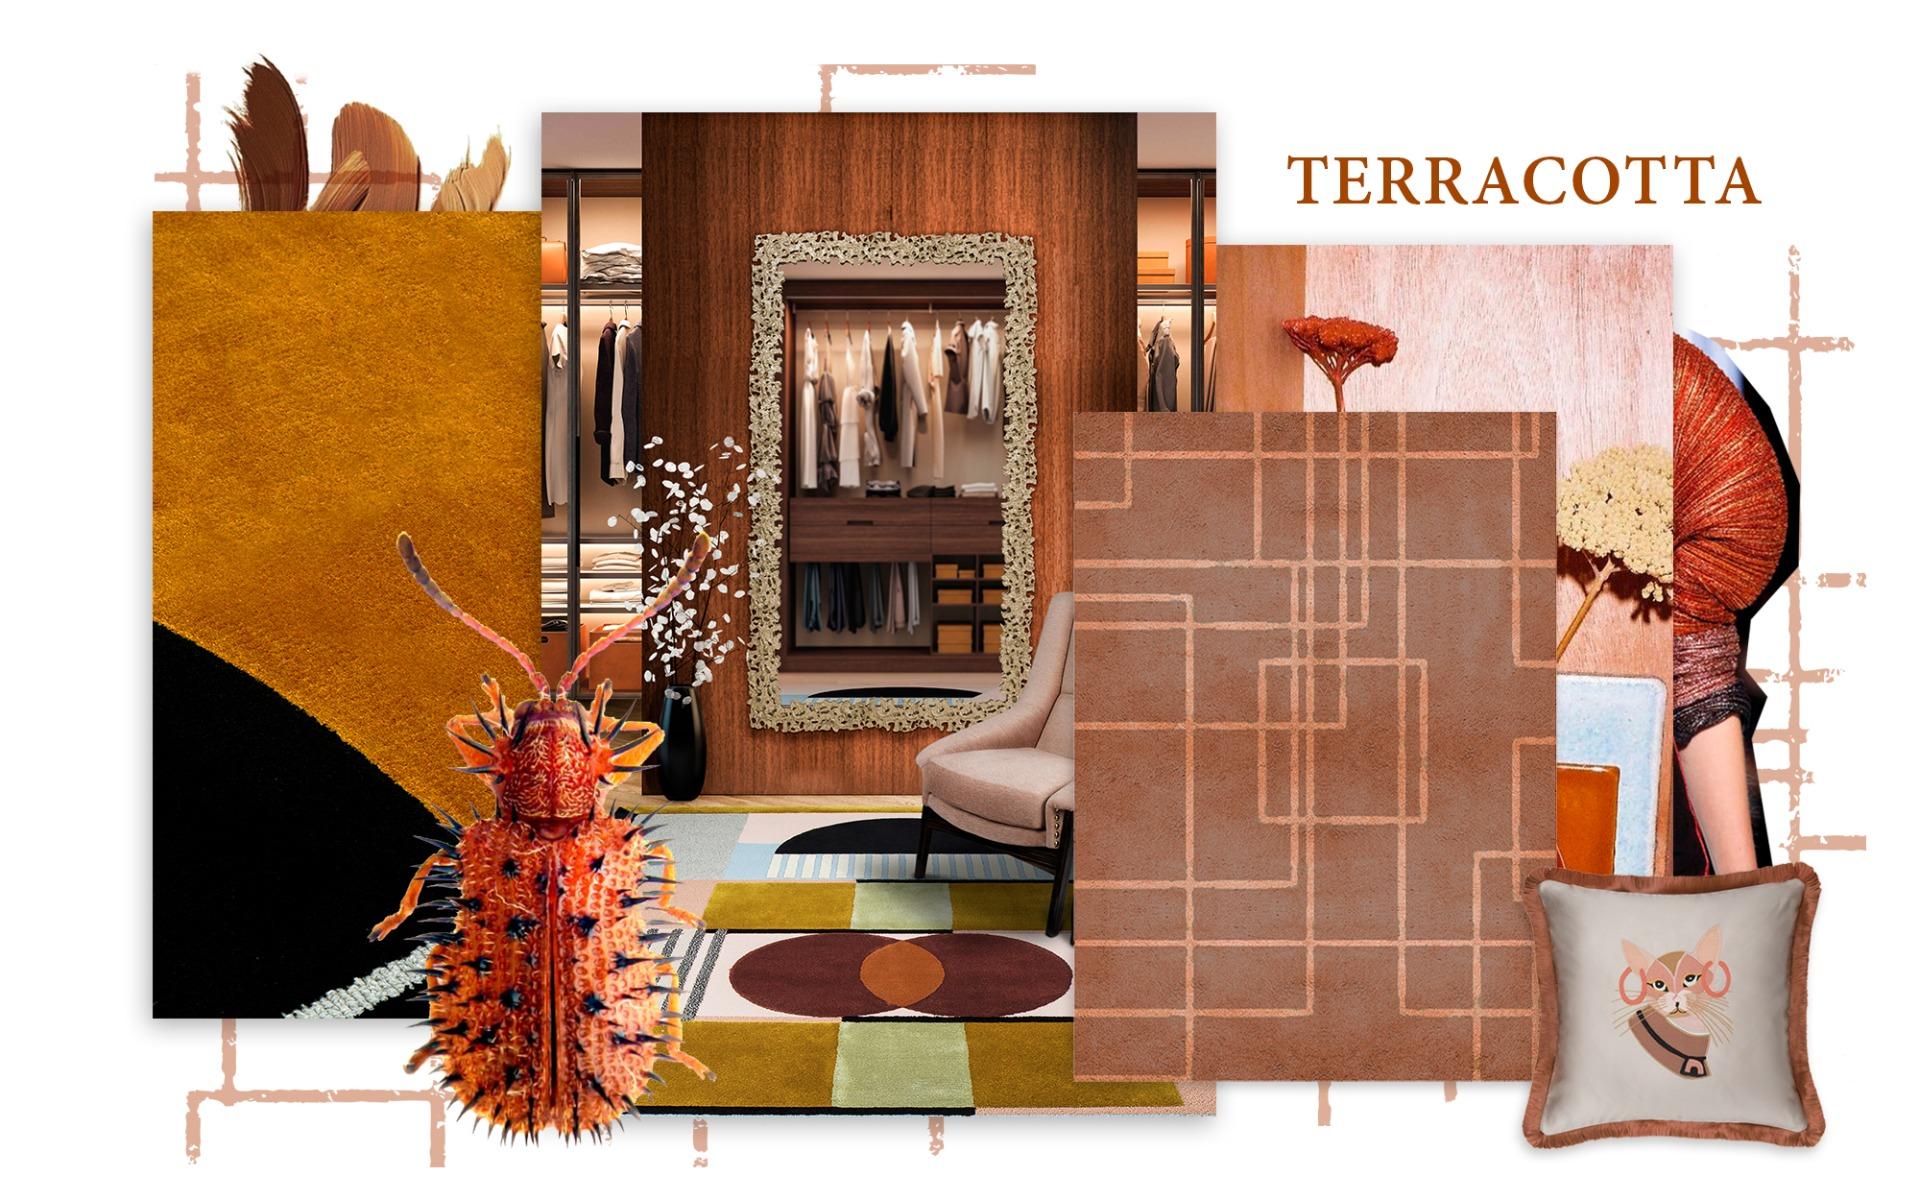 Terracotta - Trends 2019